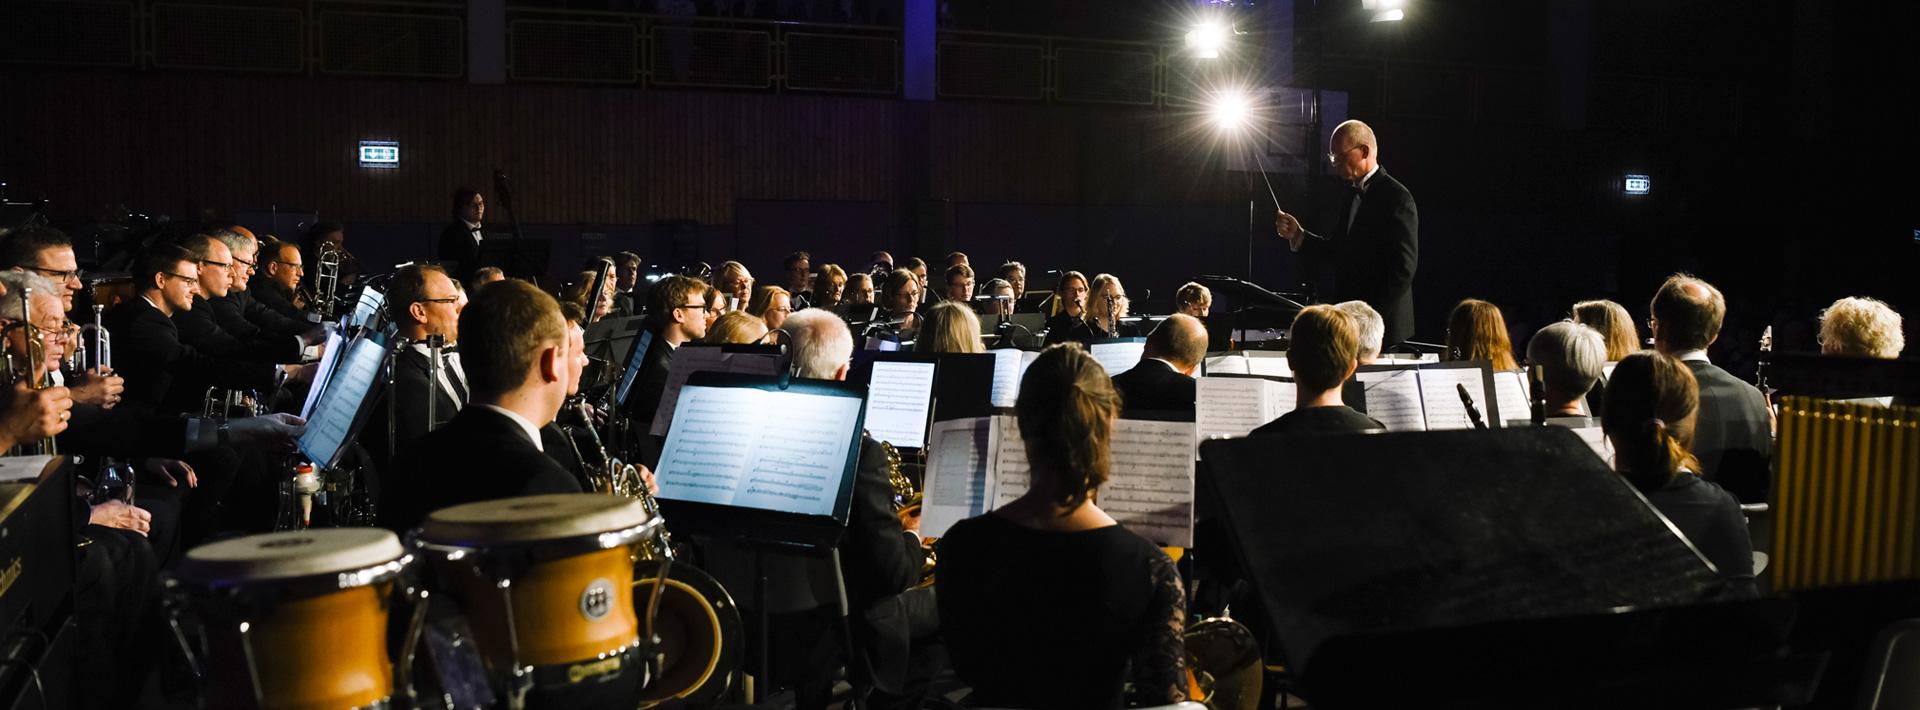 Blasorchester-Havixbeck-Slider